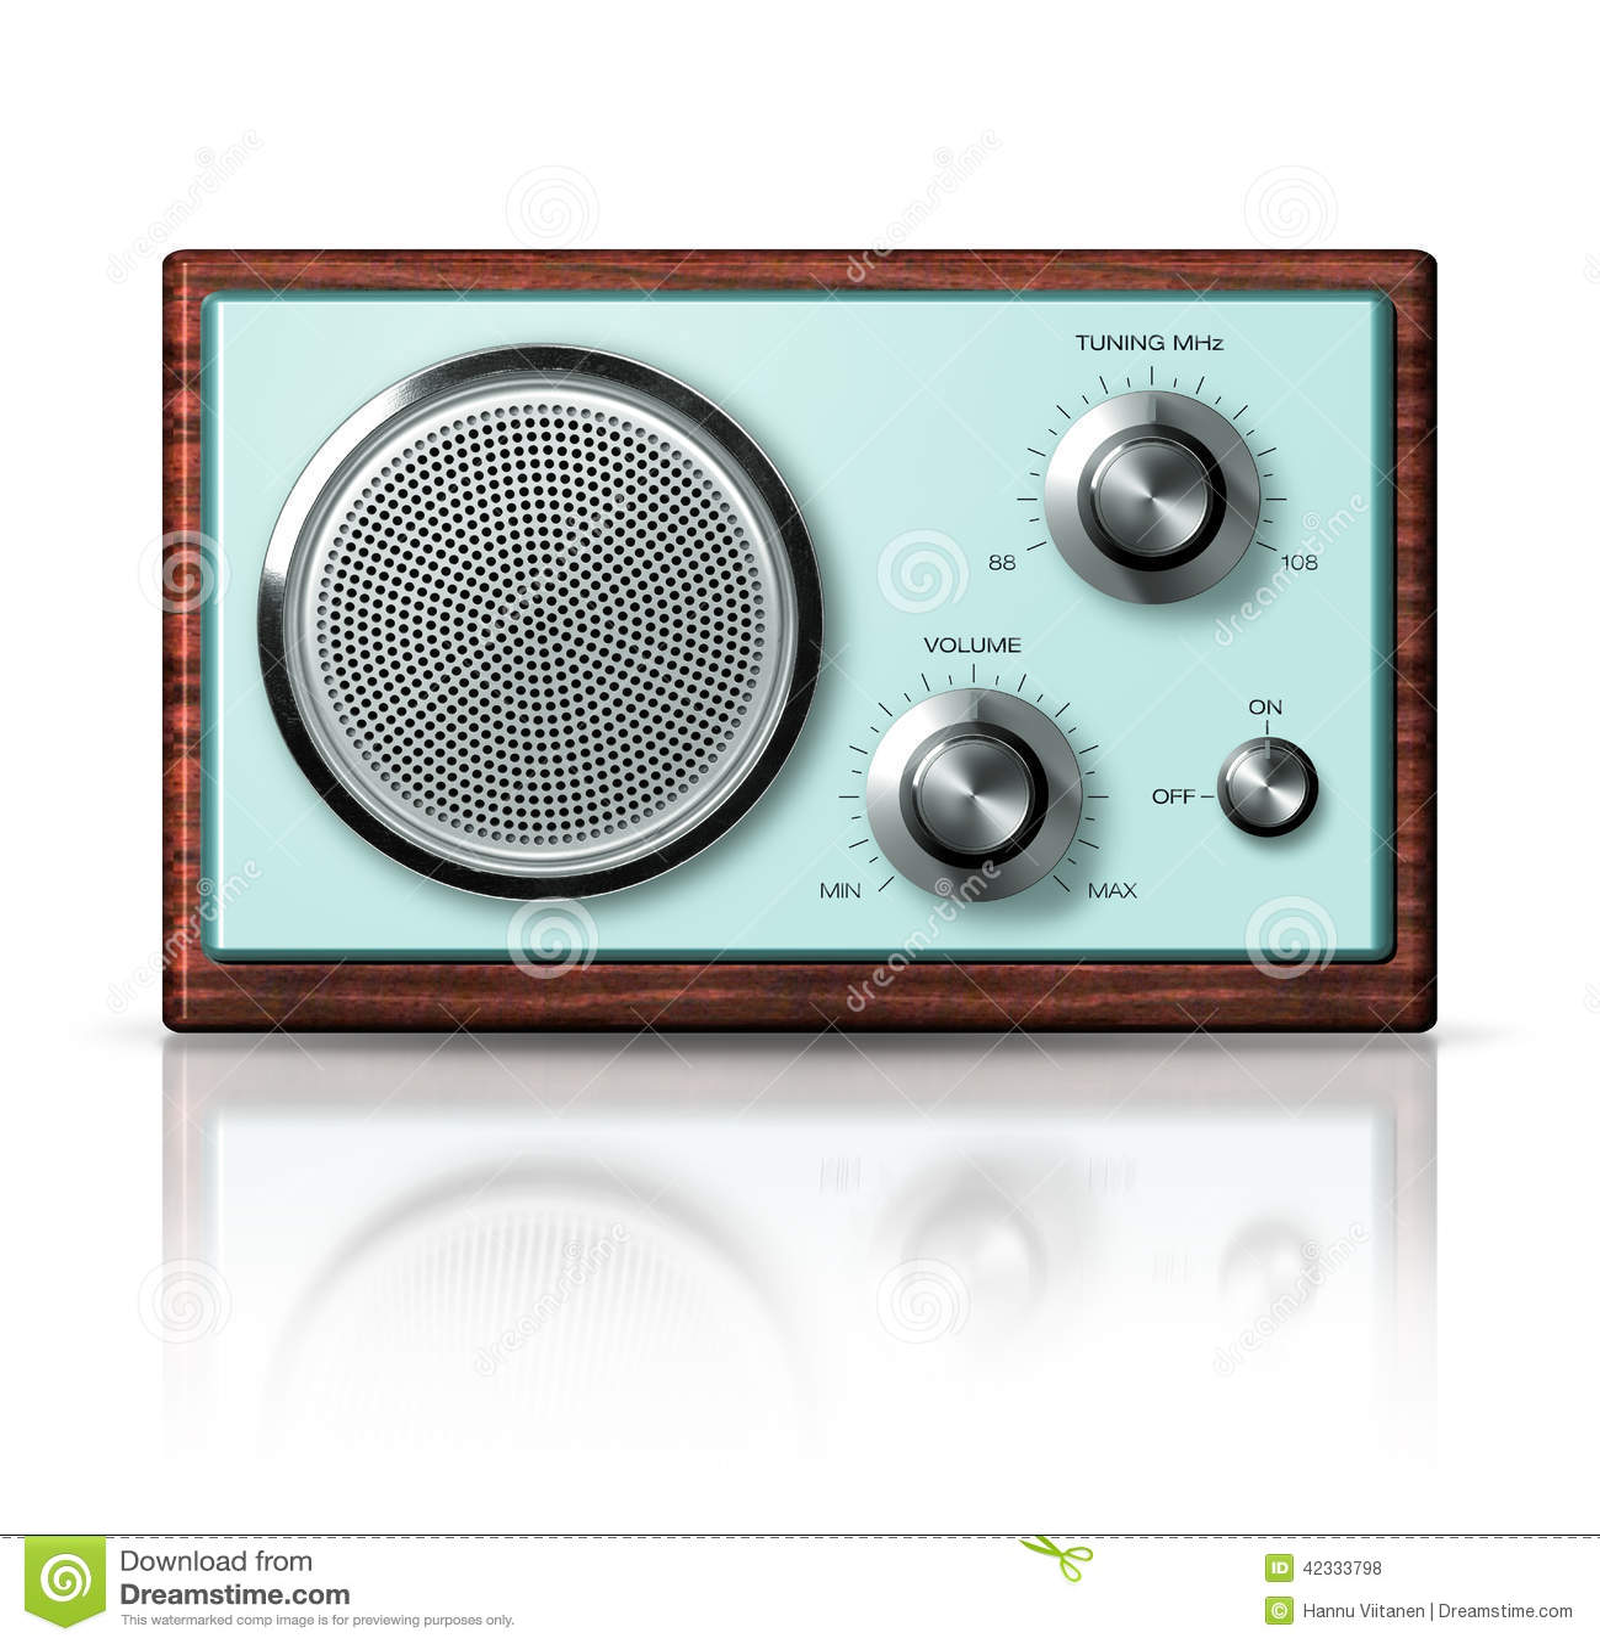 Sony Dream Machine Discontinued furthermore Sony icf Cl70 noir together with Sony Dab Radio Speaker Docking Station likewise Icf C1pj additionally Icf C1pj. on sony clock radio